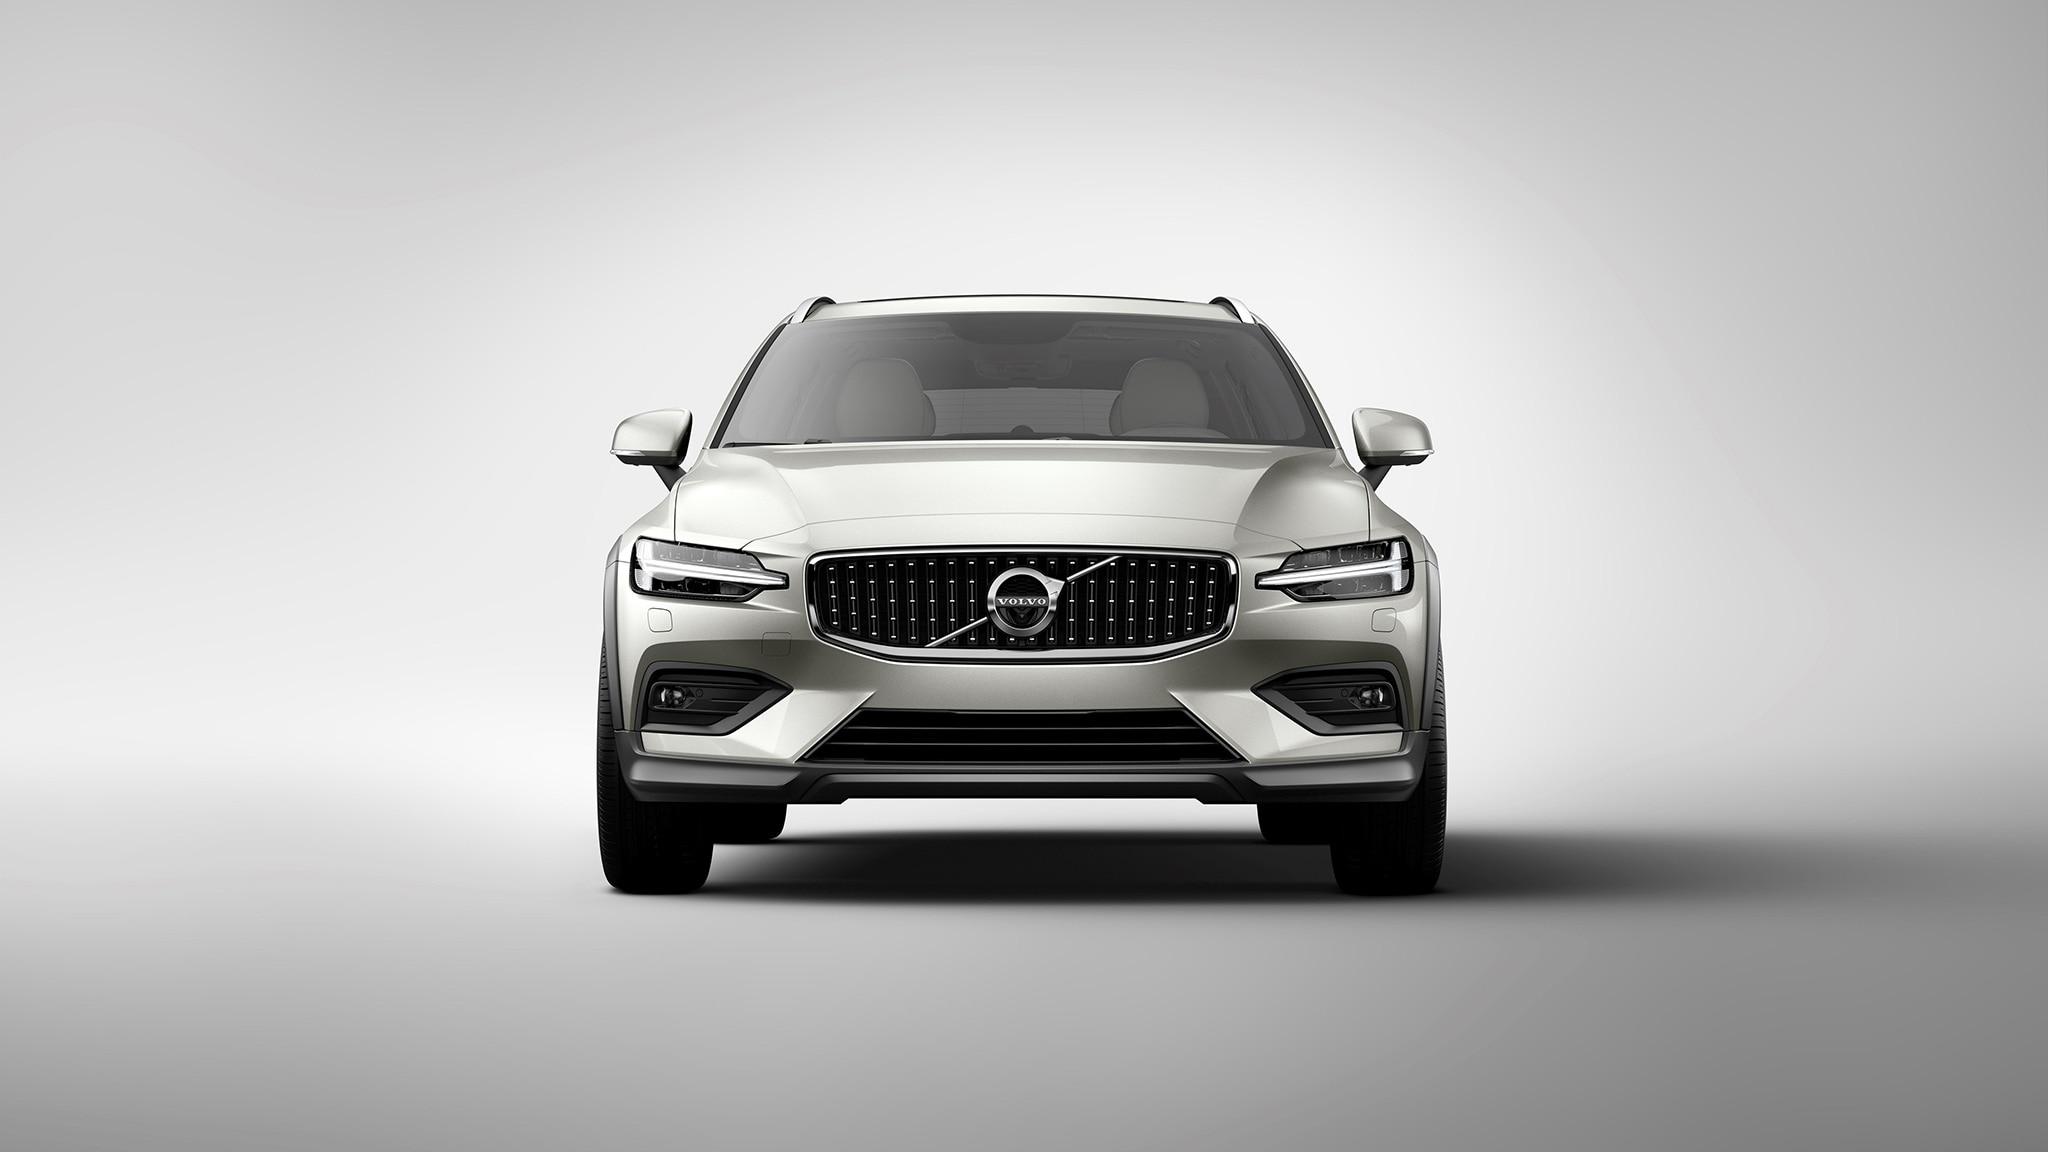 2020 Volvo XC70 Comeback News >> 2020 Volvo Xc70 Comeback News 2020 Upcoming Car Release